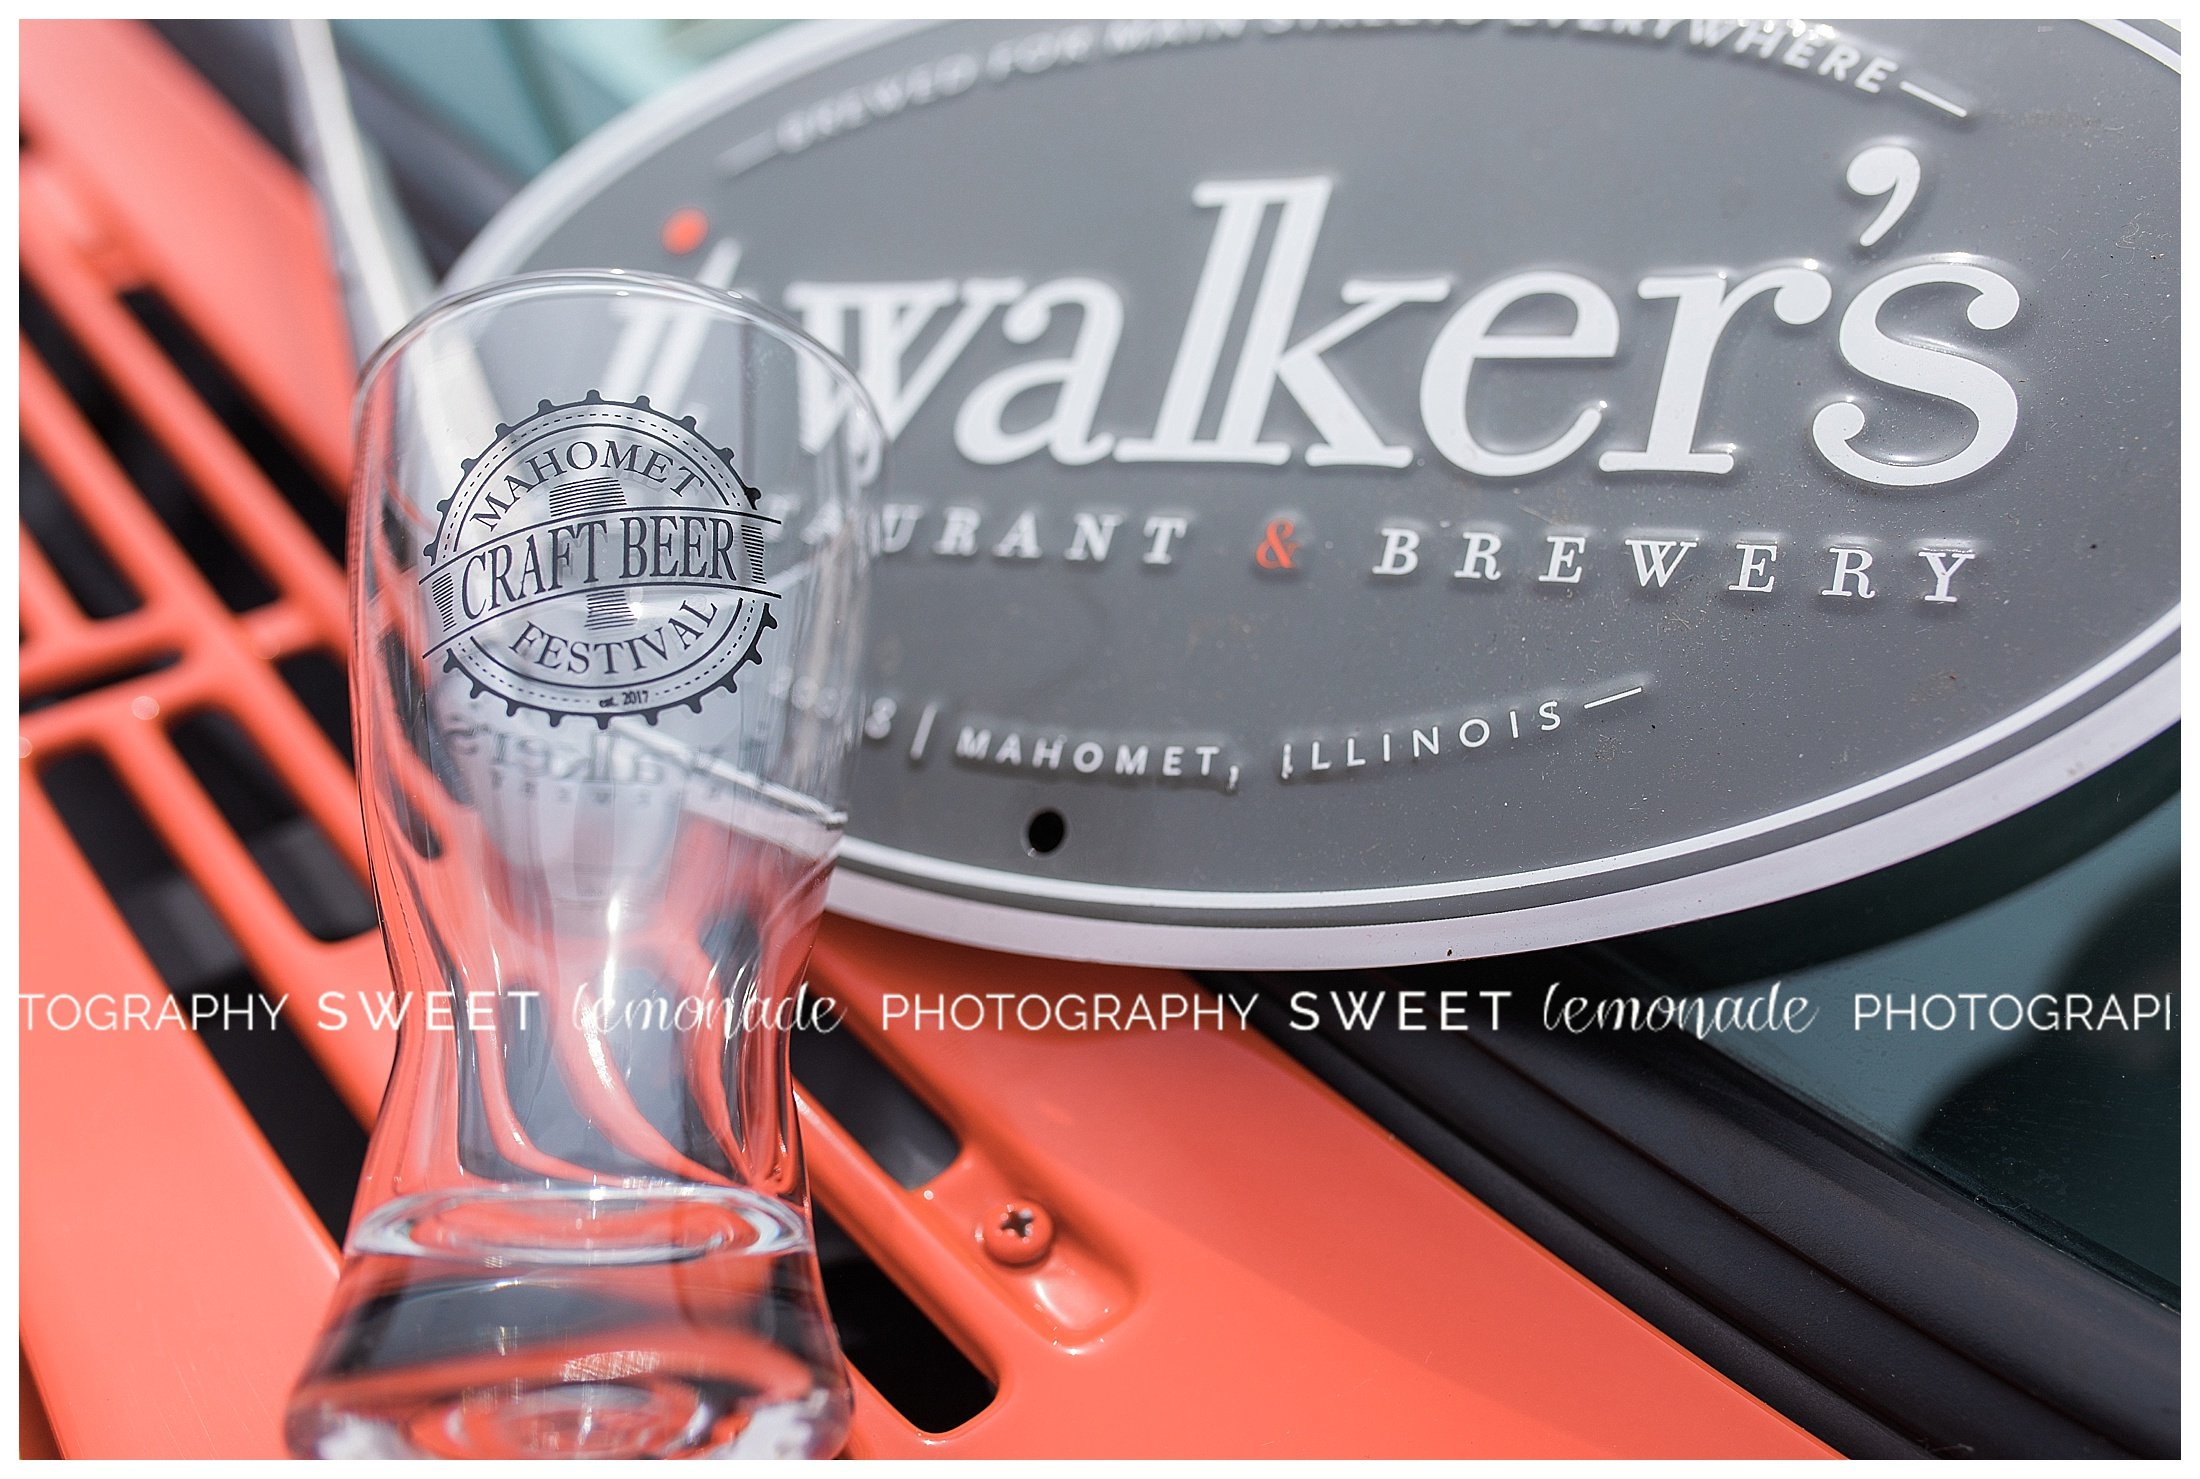 mahomet-illinois-spring-craft-beer-festival-jtwalkers-champaign-county-haymarket_2039.jpg